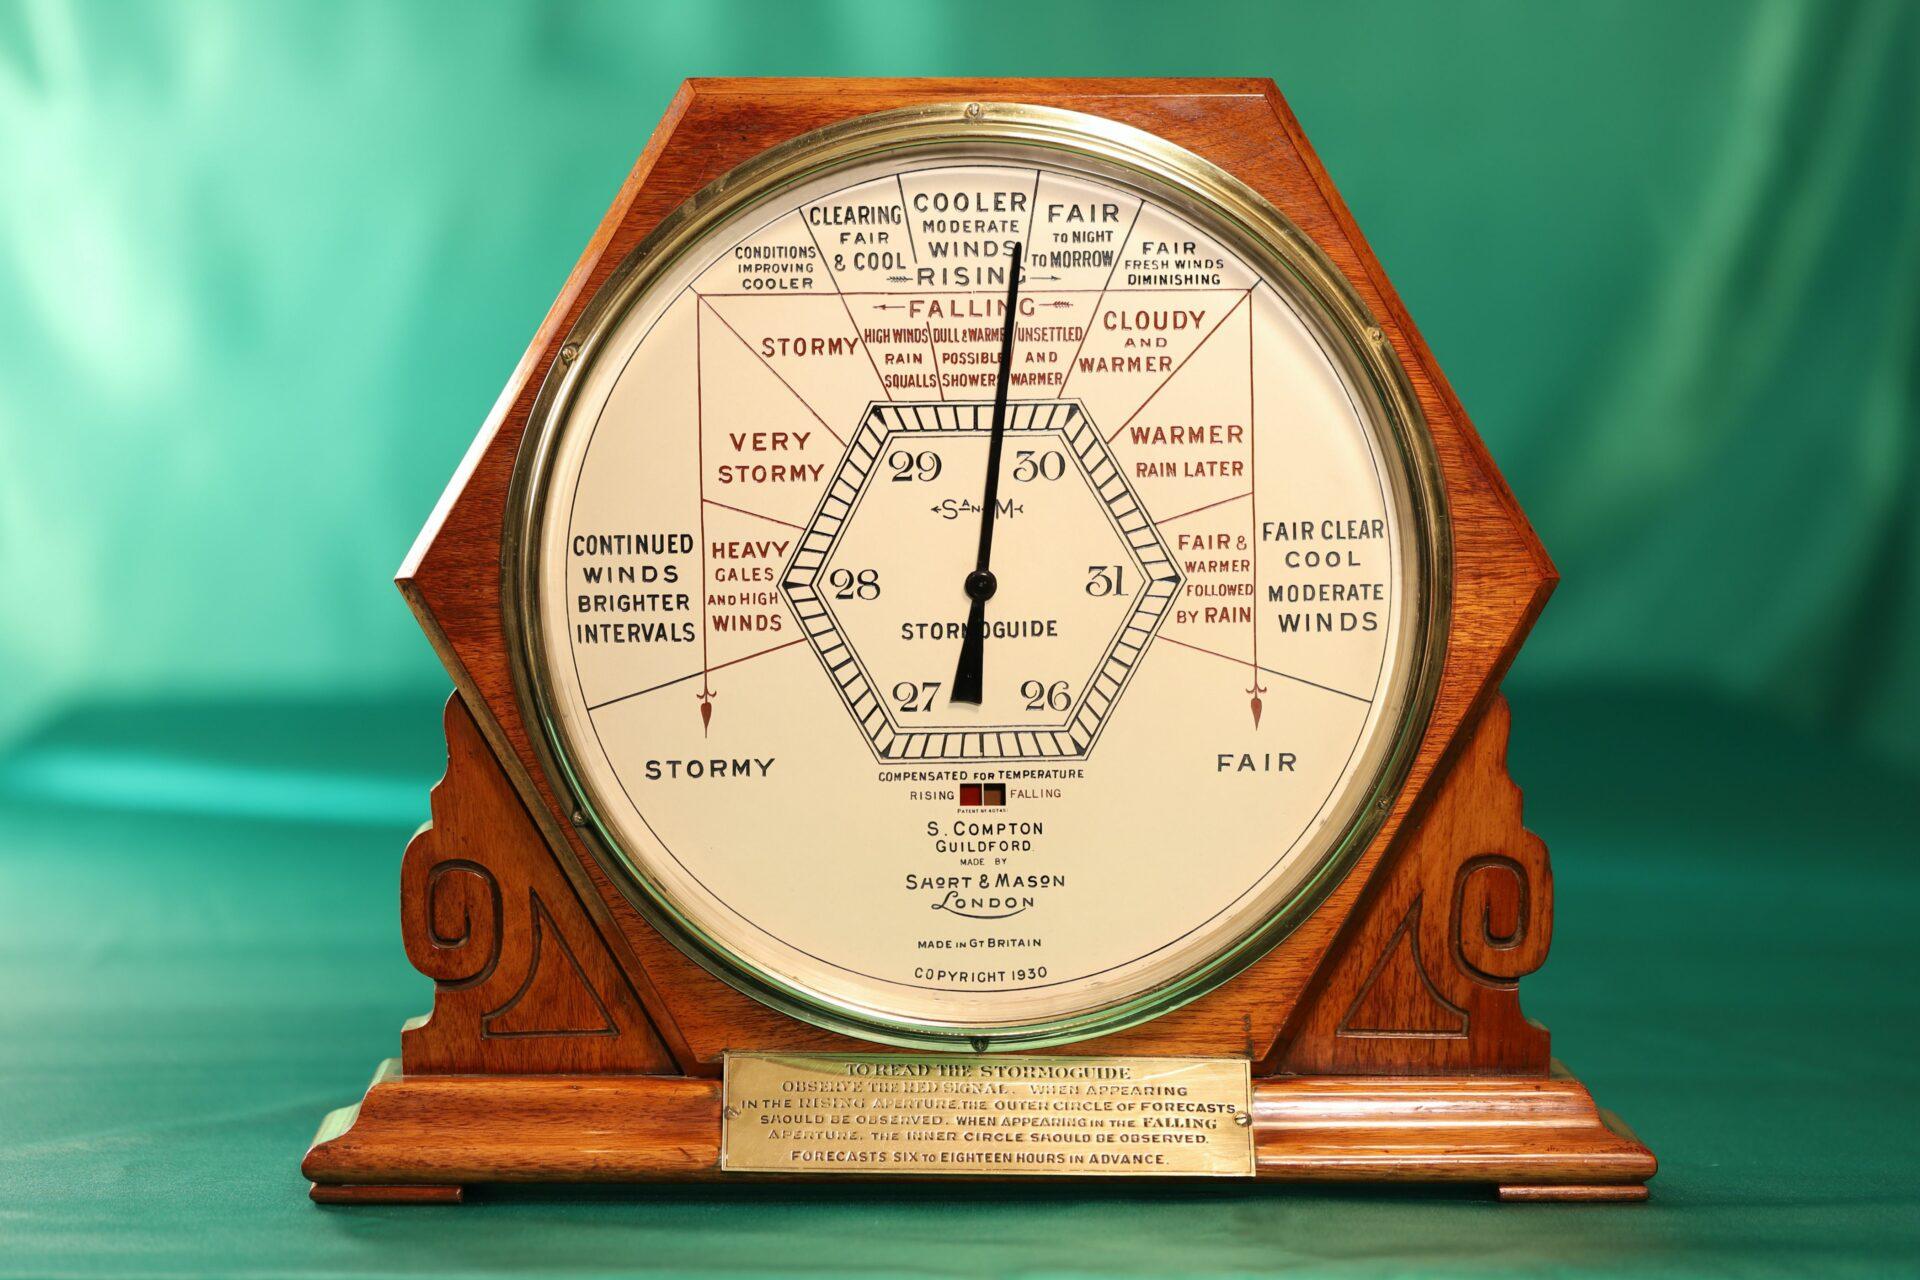 Image of front of Short & Mason Hexagonal Stormoguide Barometer c1935